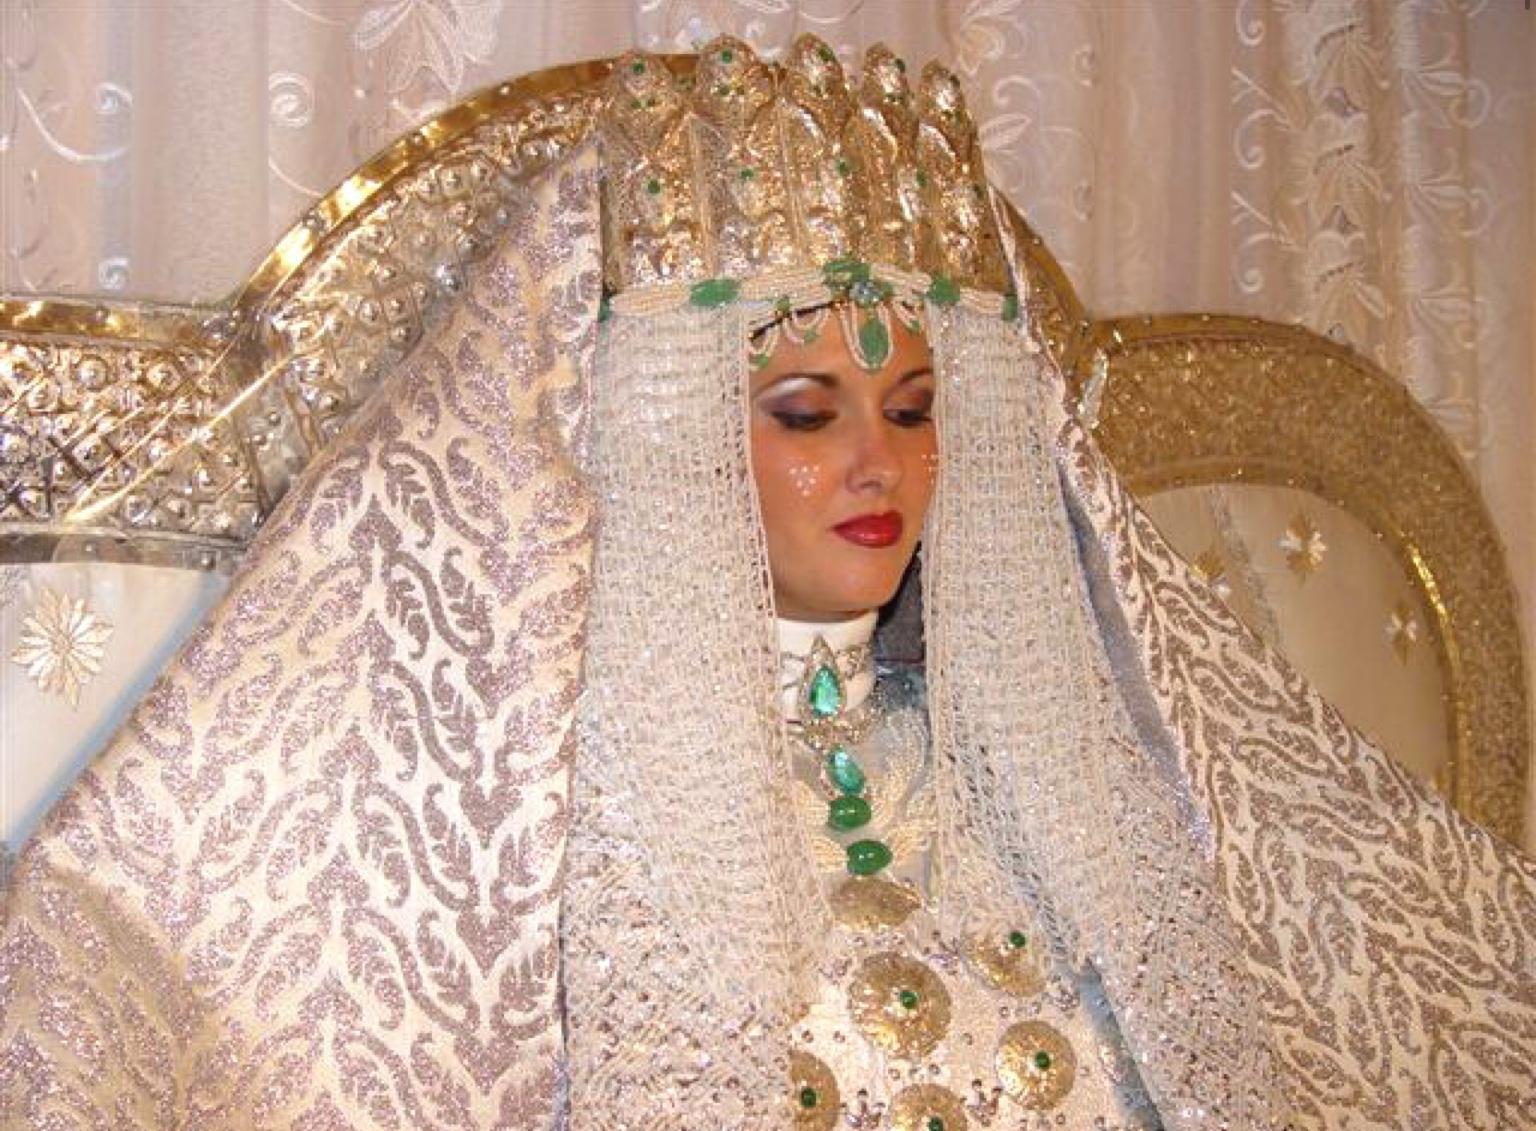 4a27991ff أزياء العرائس حسب 7 مناطق مغربية - Welovebuzz - عربية